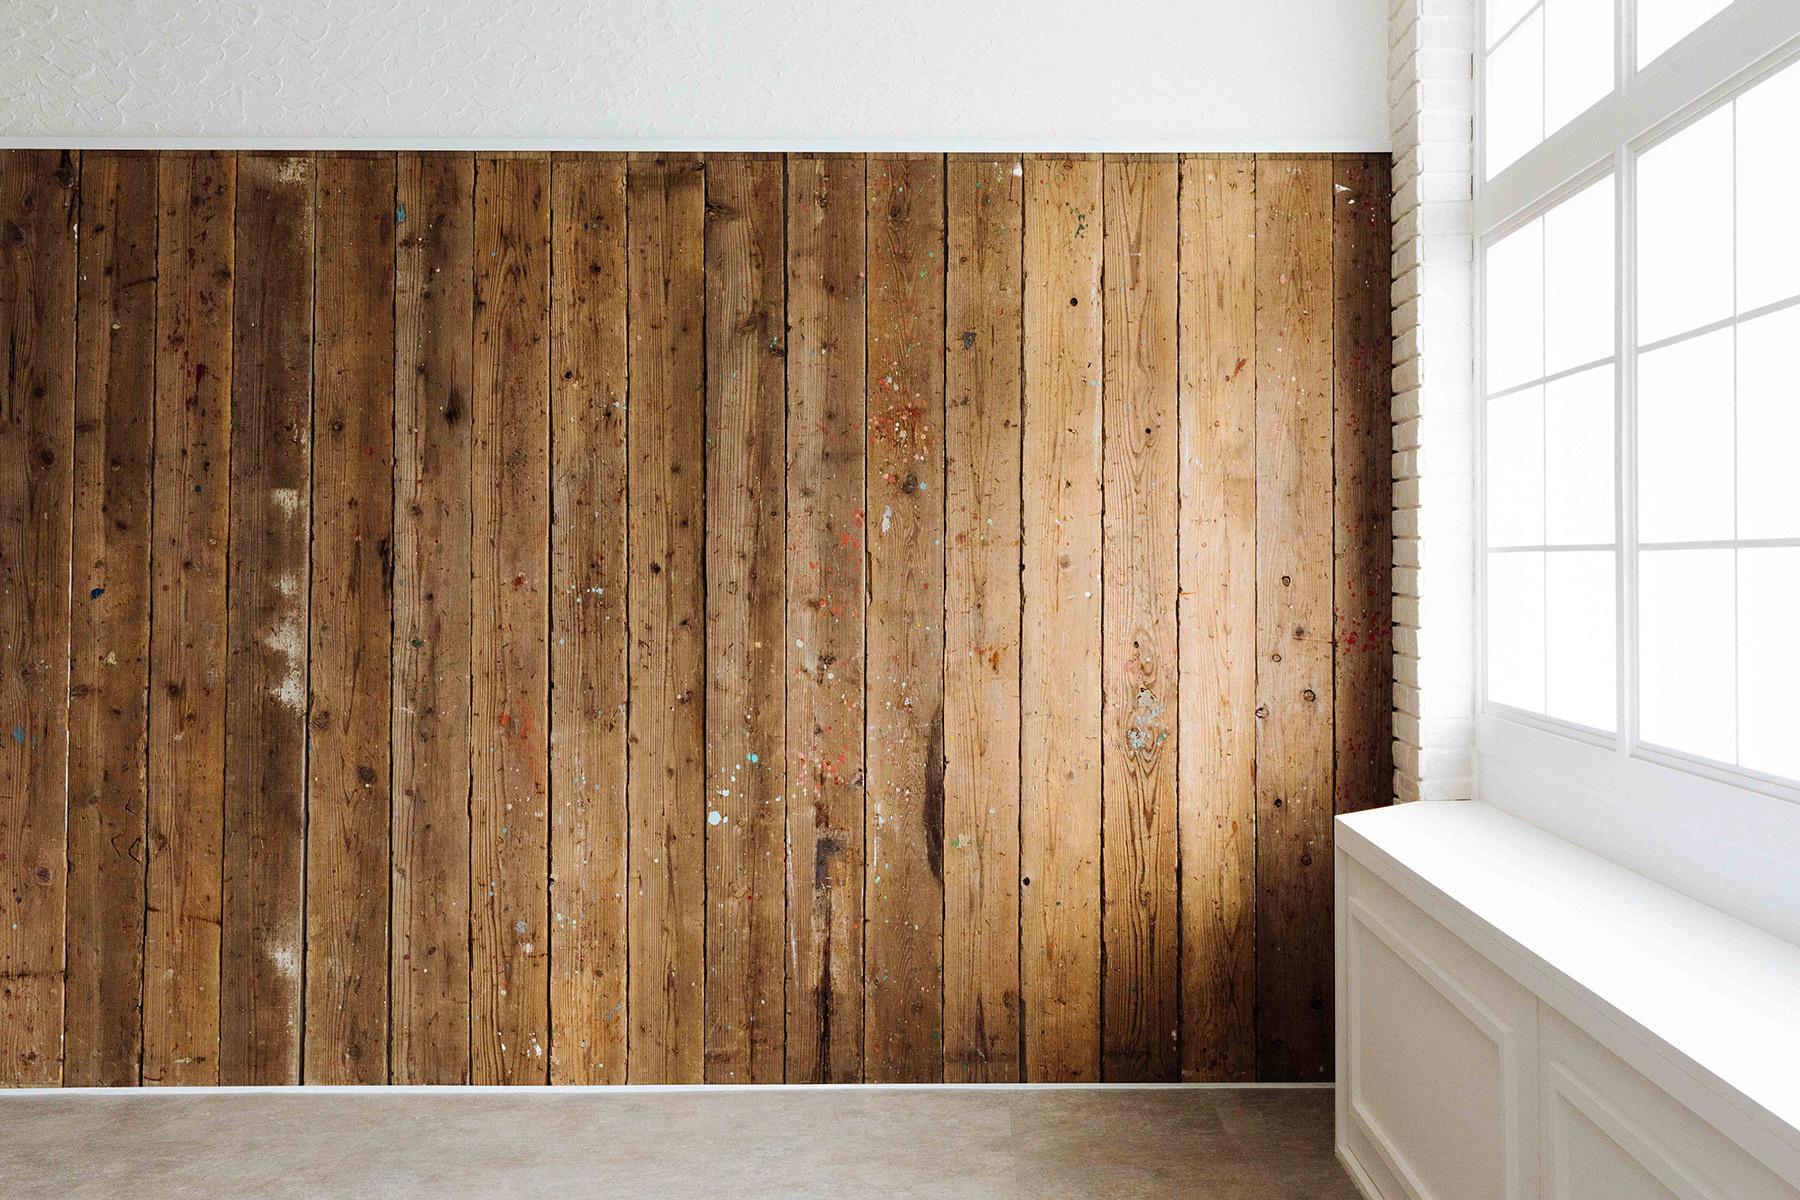 STUDIO TWOBEE  (スタジオ トゥービー)差替え可能なウッドパネル